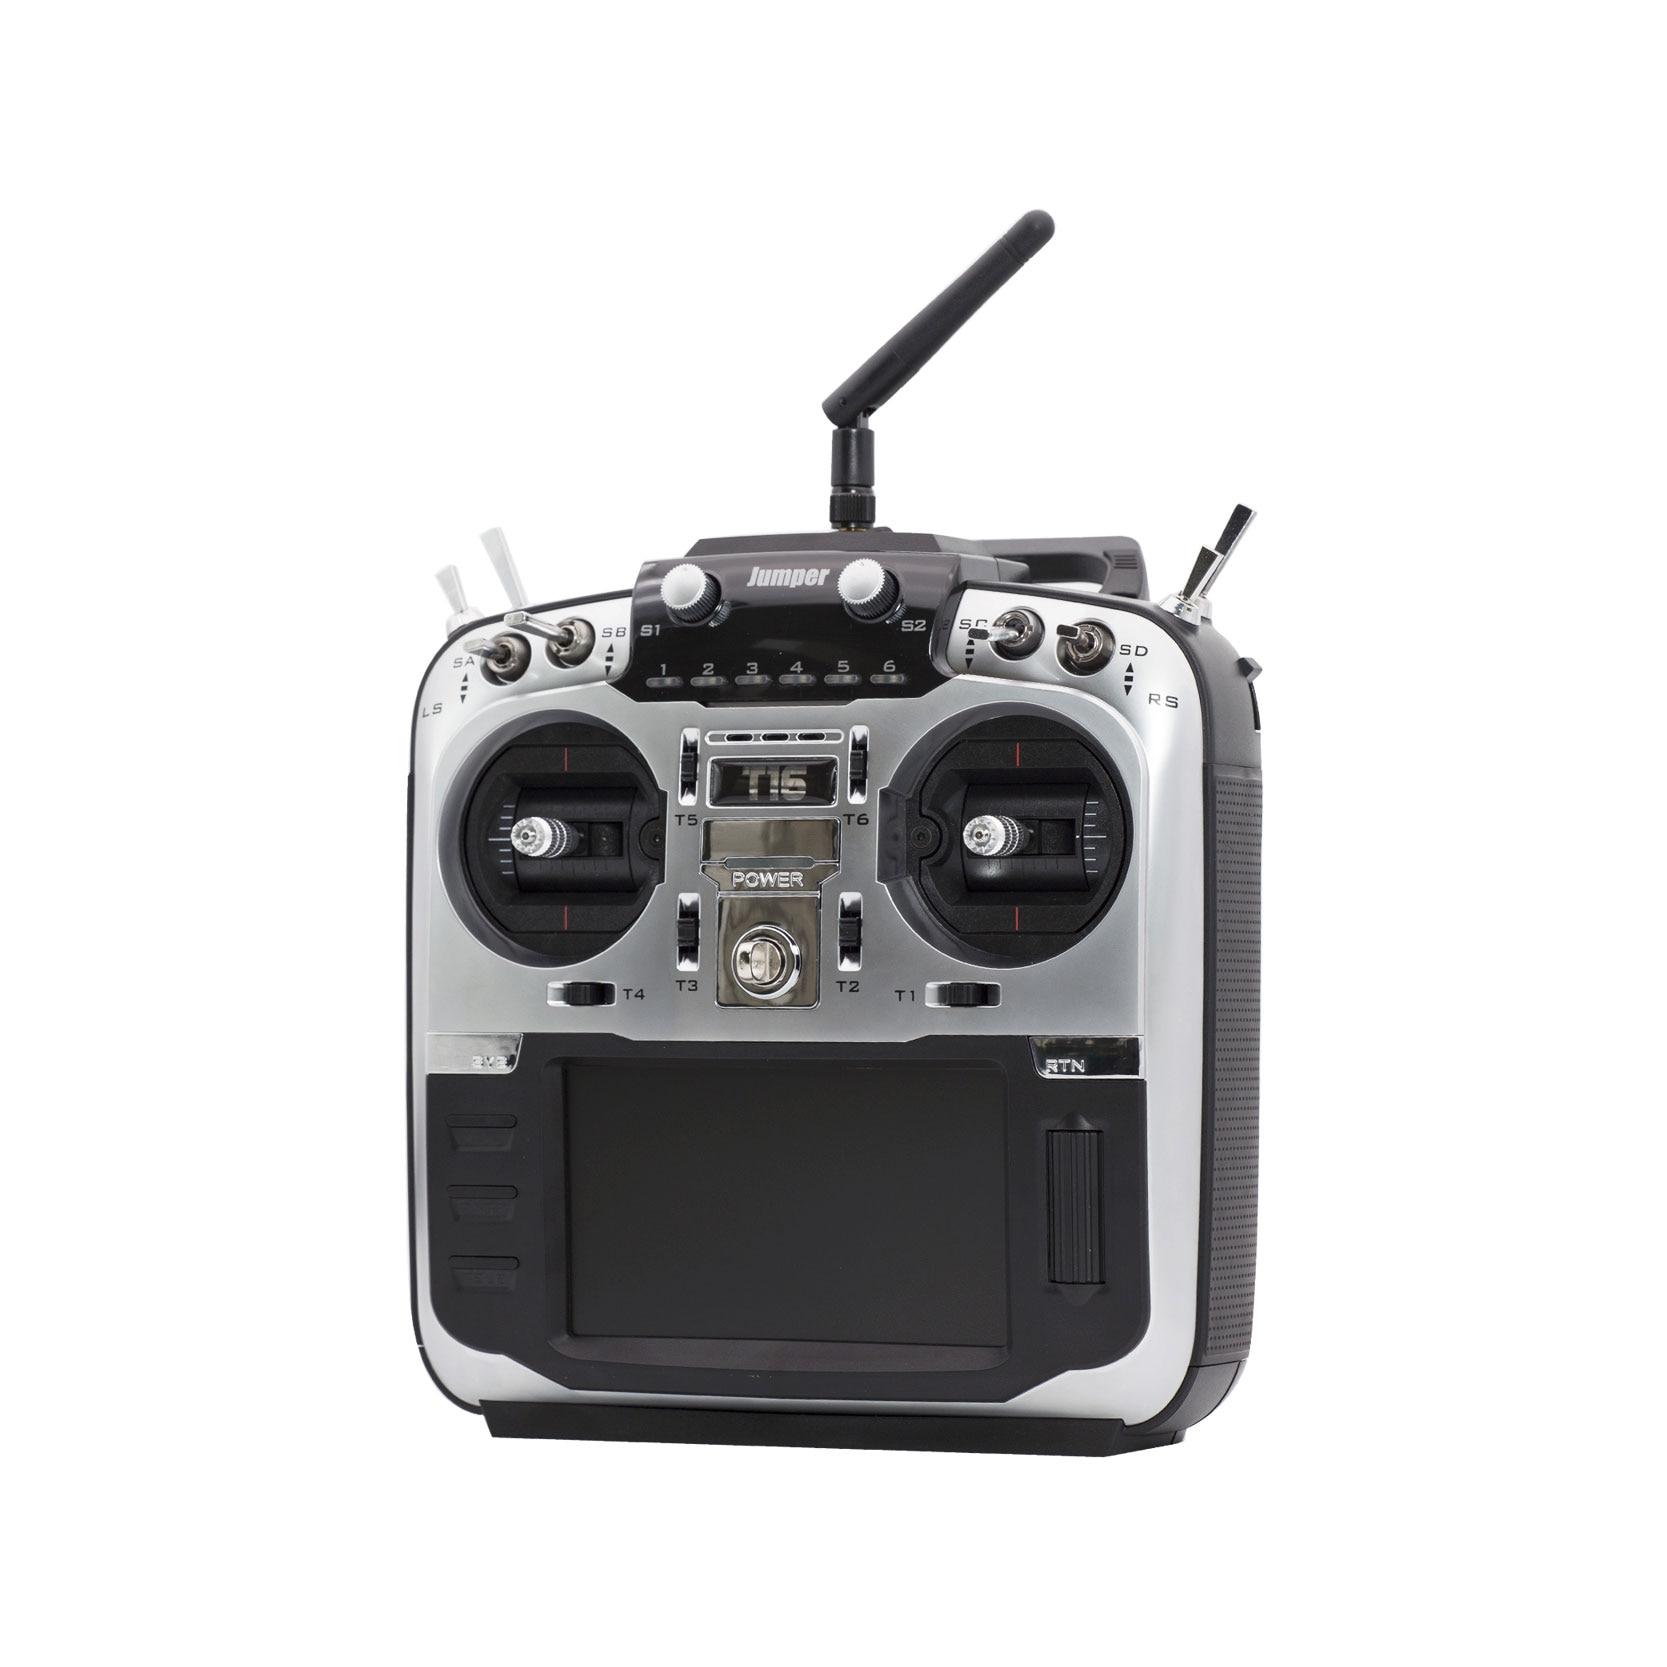 Jumper-XYZ T16 Pro Hall V2 Gimbal Open Source Multi-protocol Radio Transmitter JP4-in-1 RF Module 2.4G 16CH 4.3